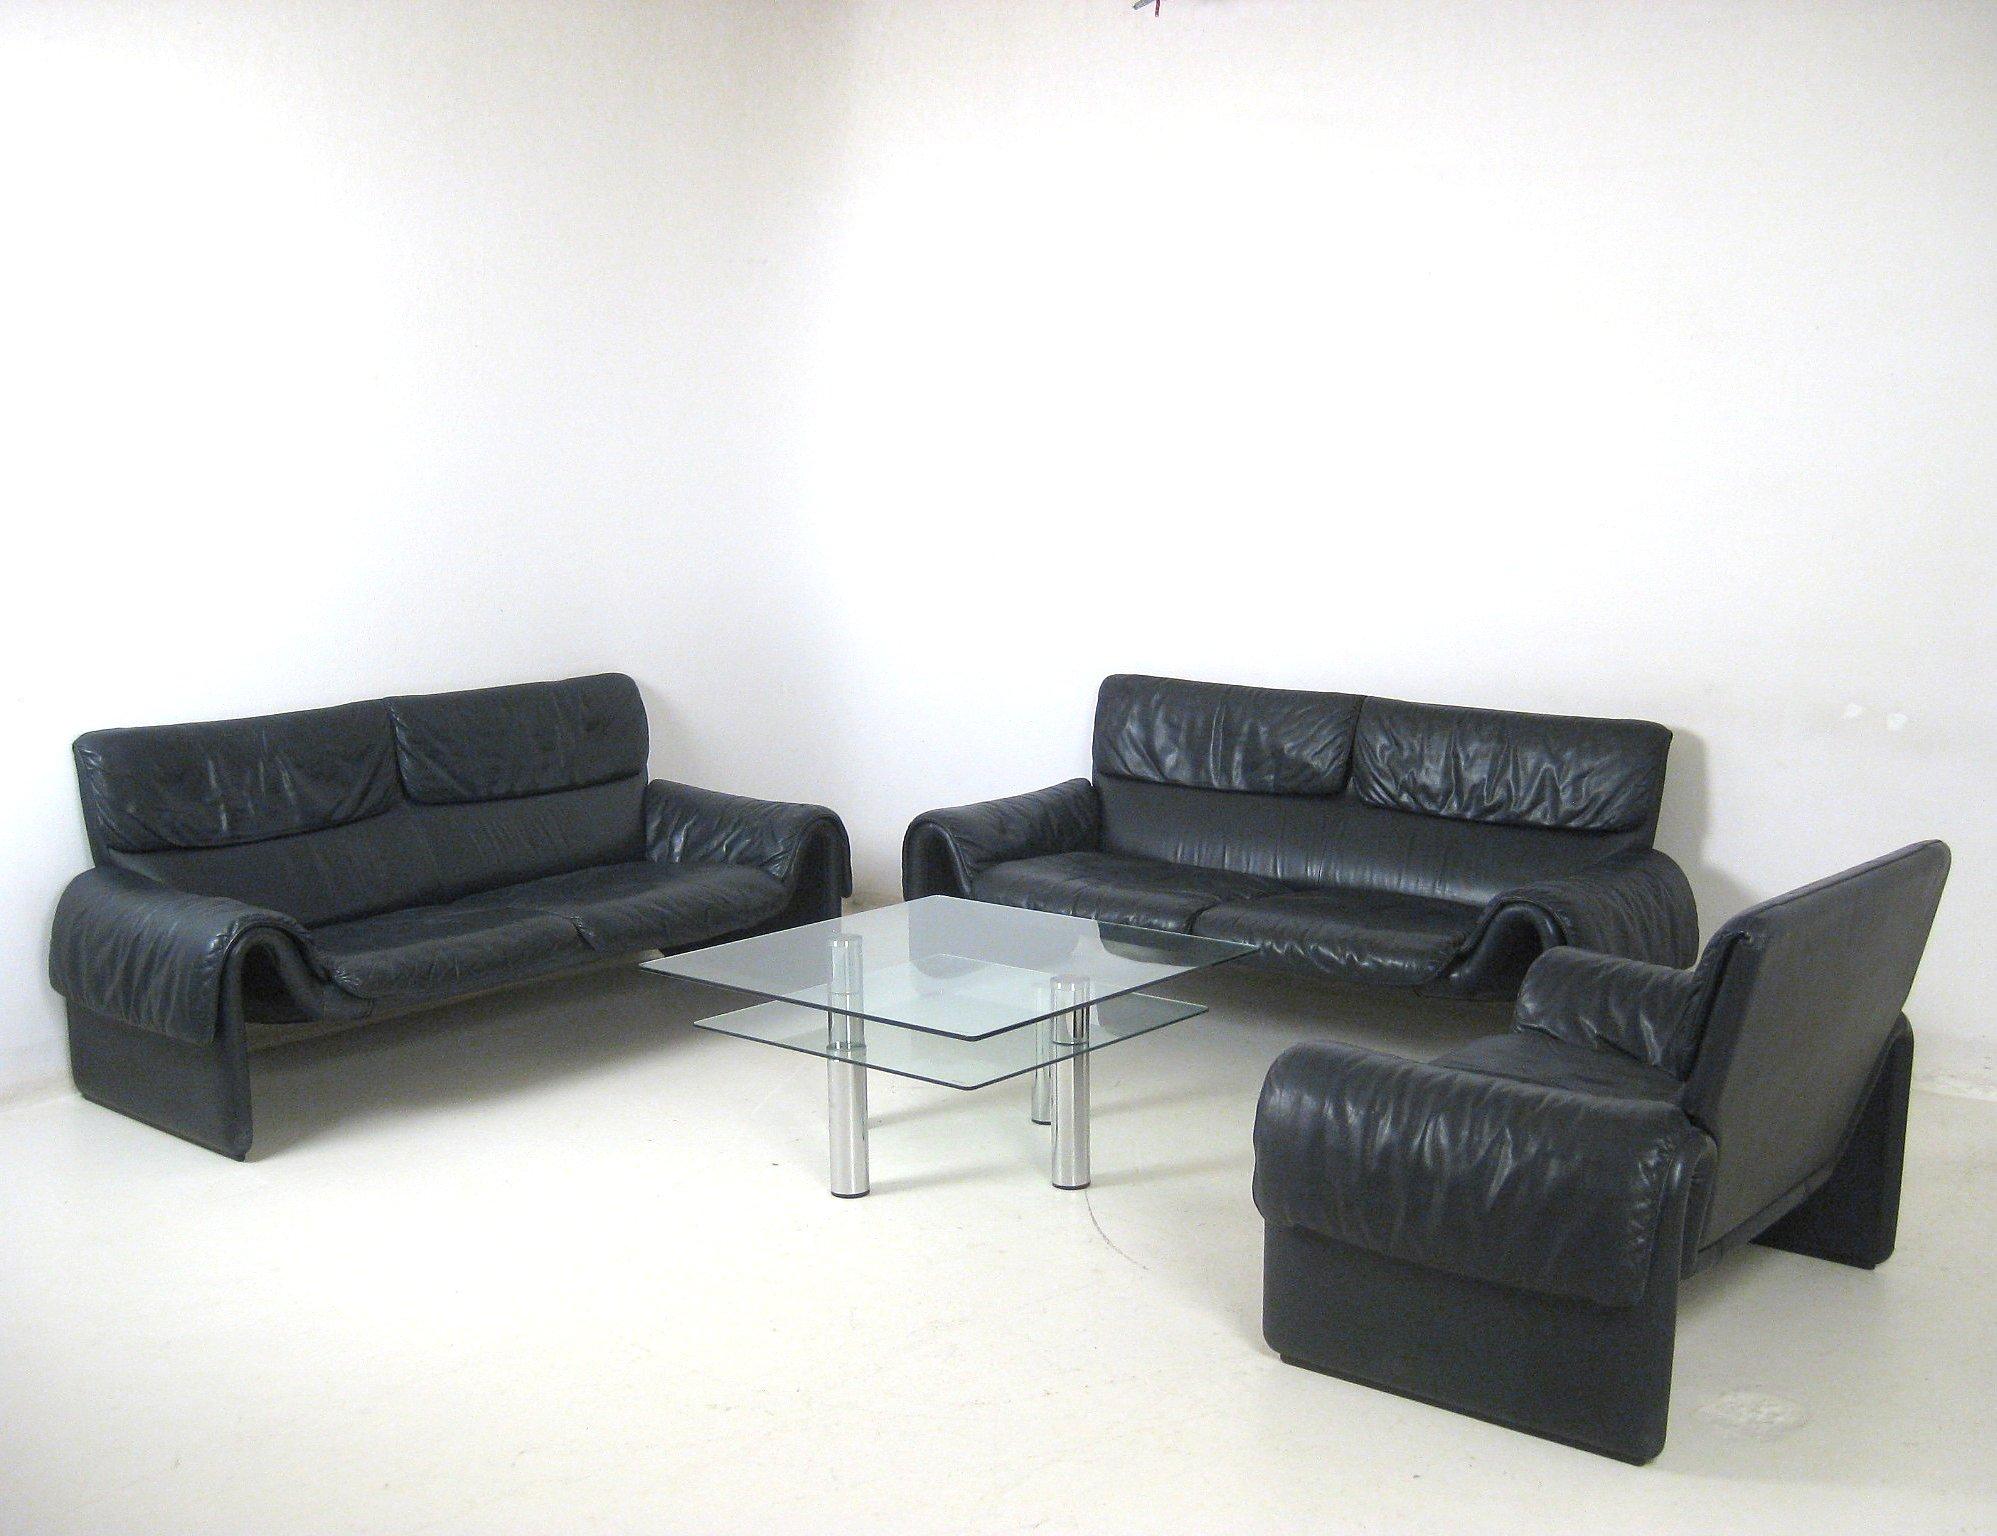 Faszinierend Sofa Und Sessel Beste Wahl De Sede, Lounge Sofas + Modell Ds